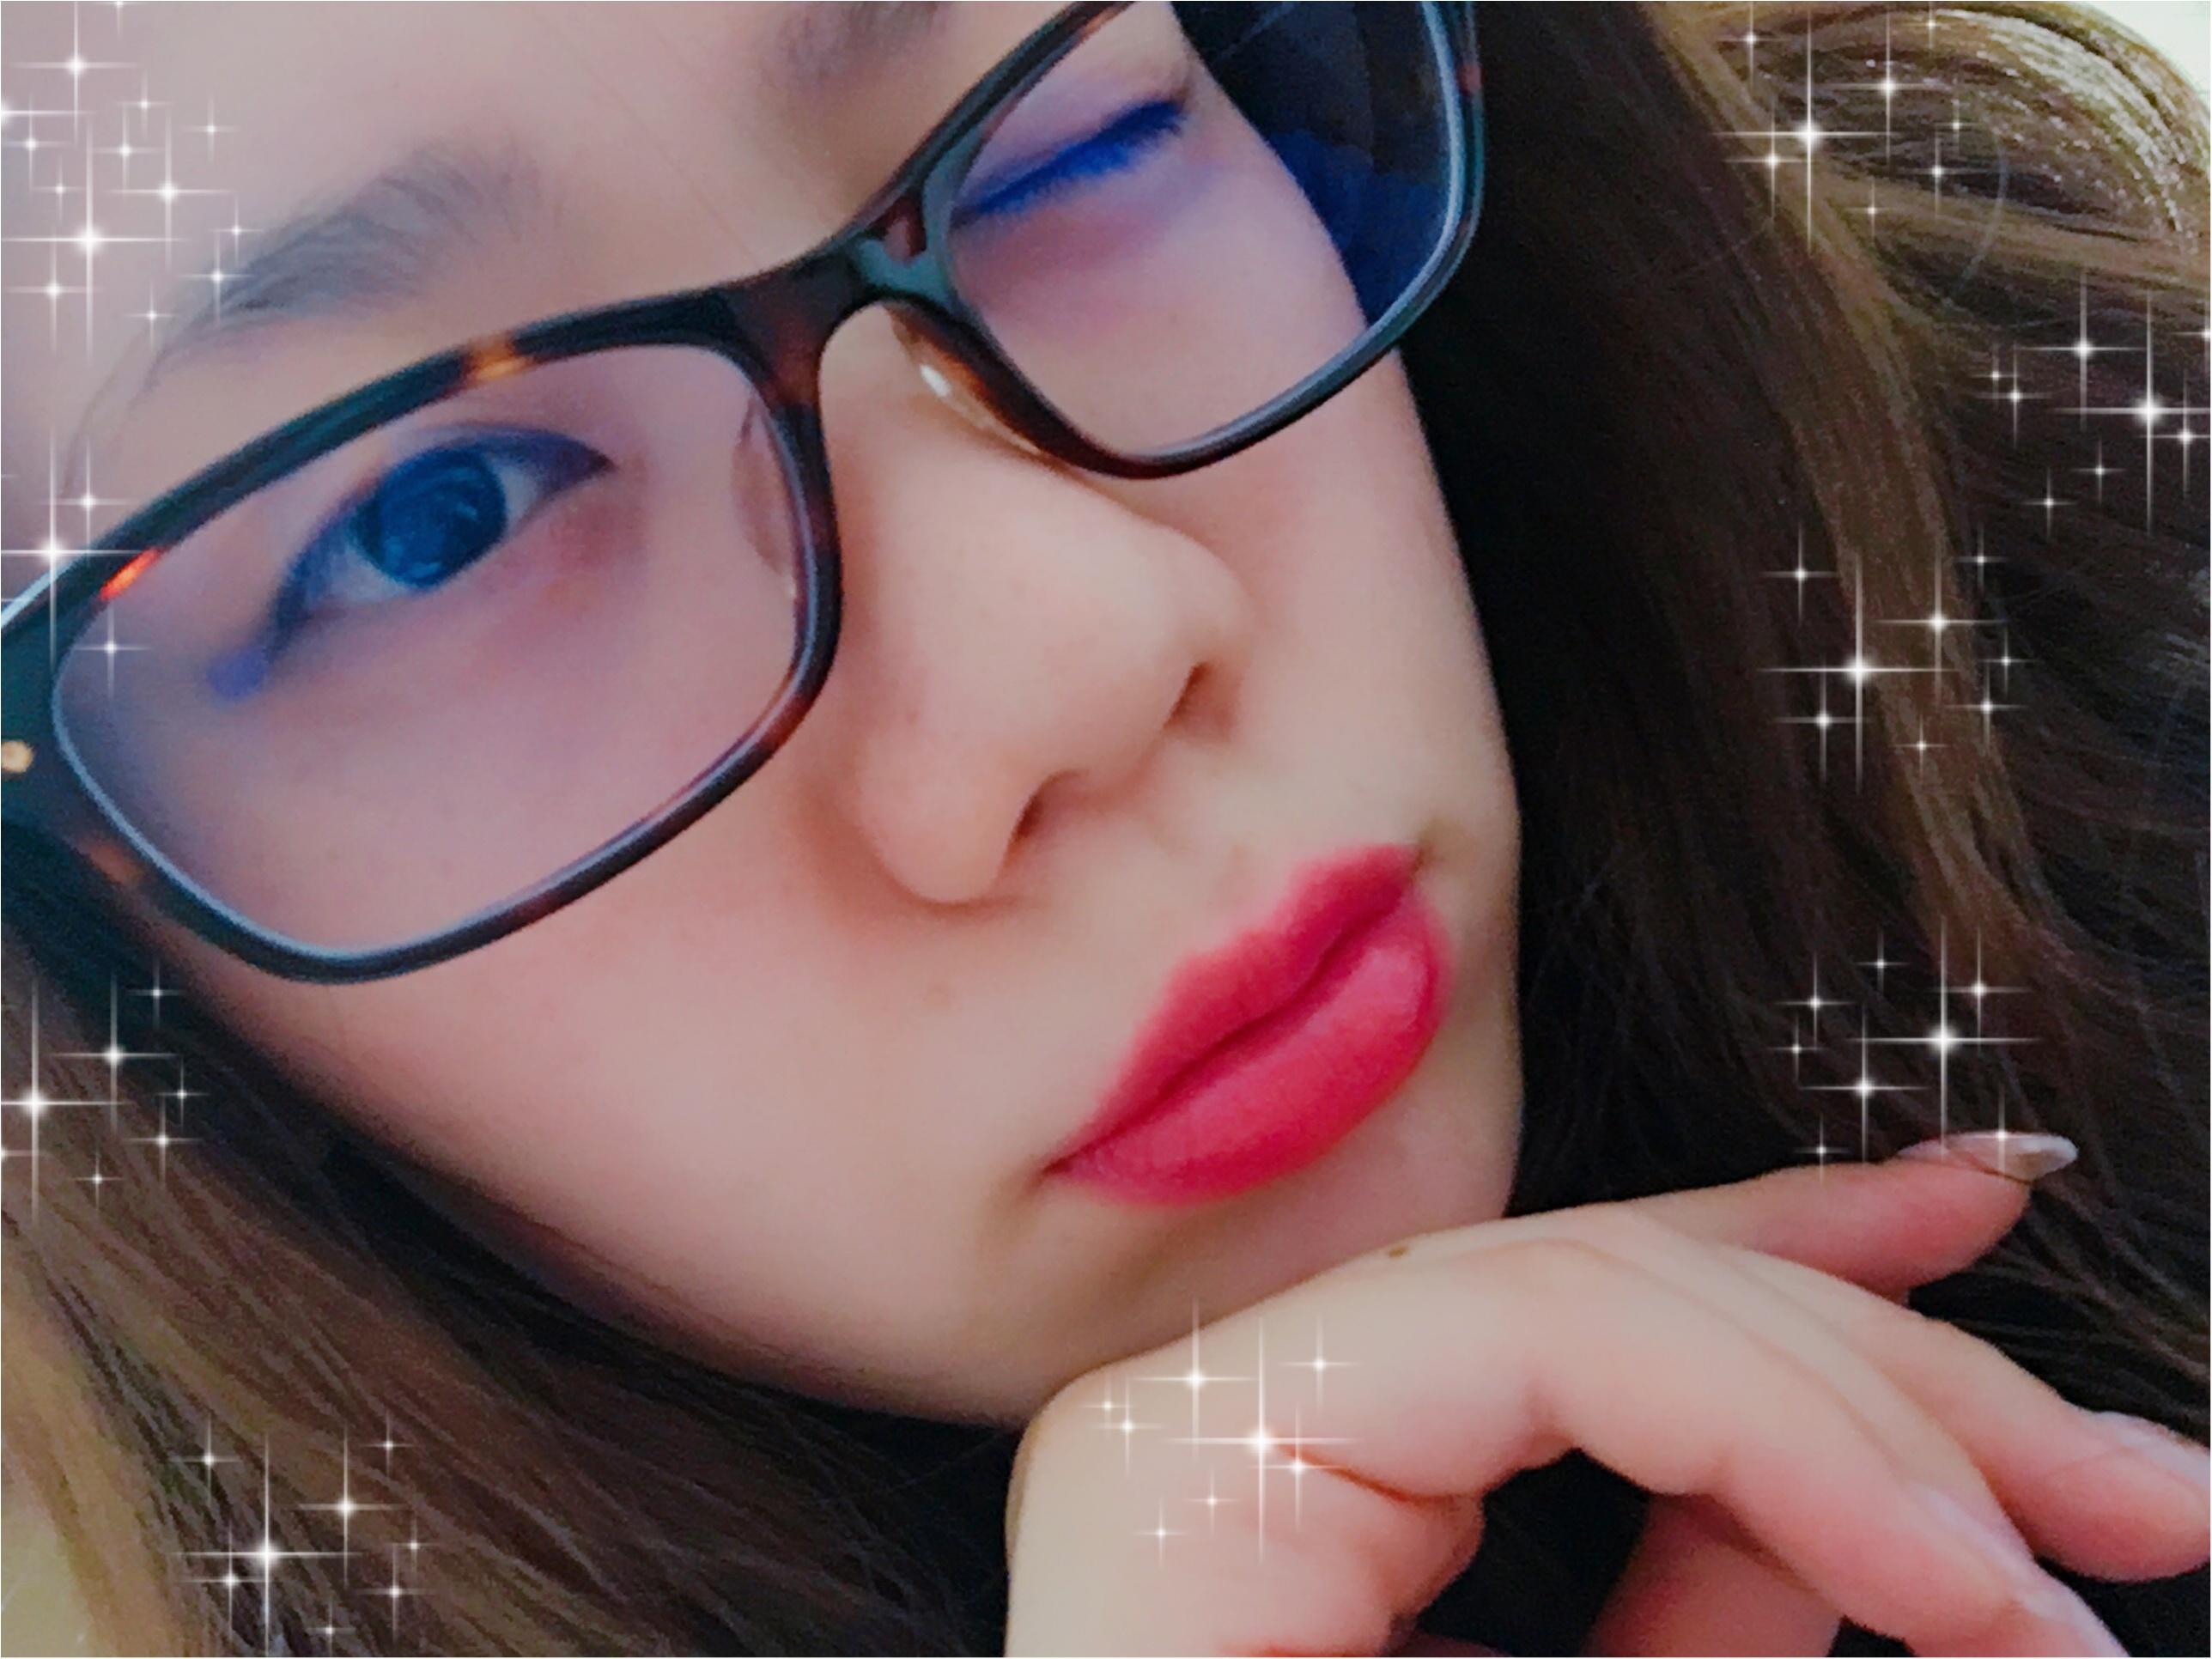 Dior アディクトラッカースティック♡♡♡新感覚のフォンダンリップ!?発色の良さと塗り心地が最高♡☺︎_8